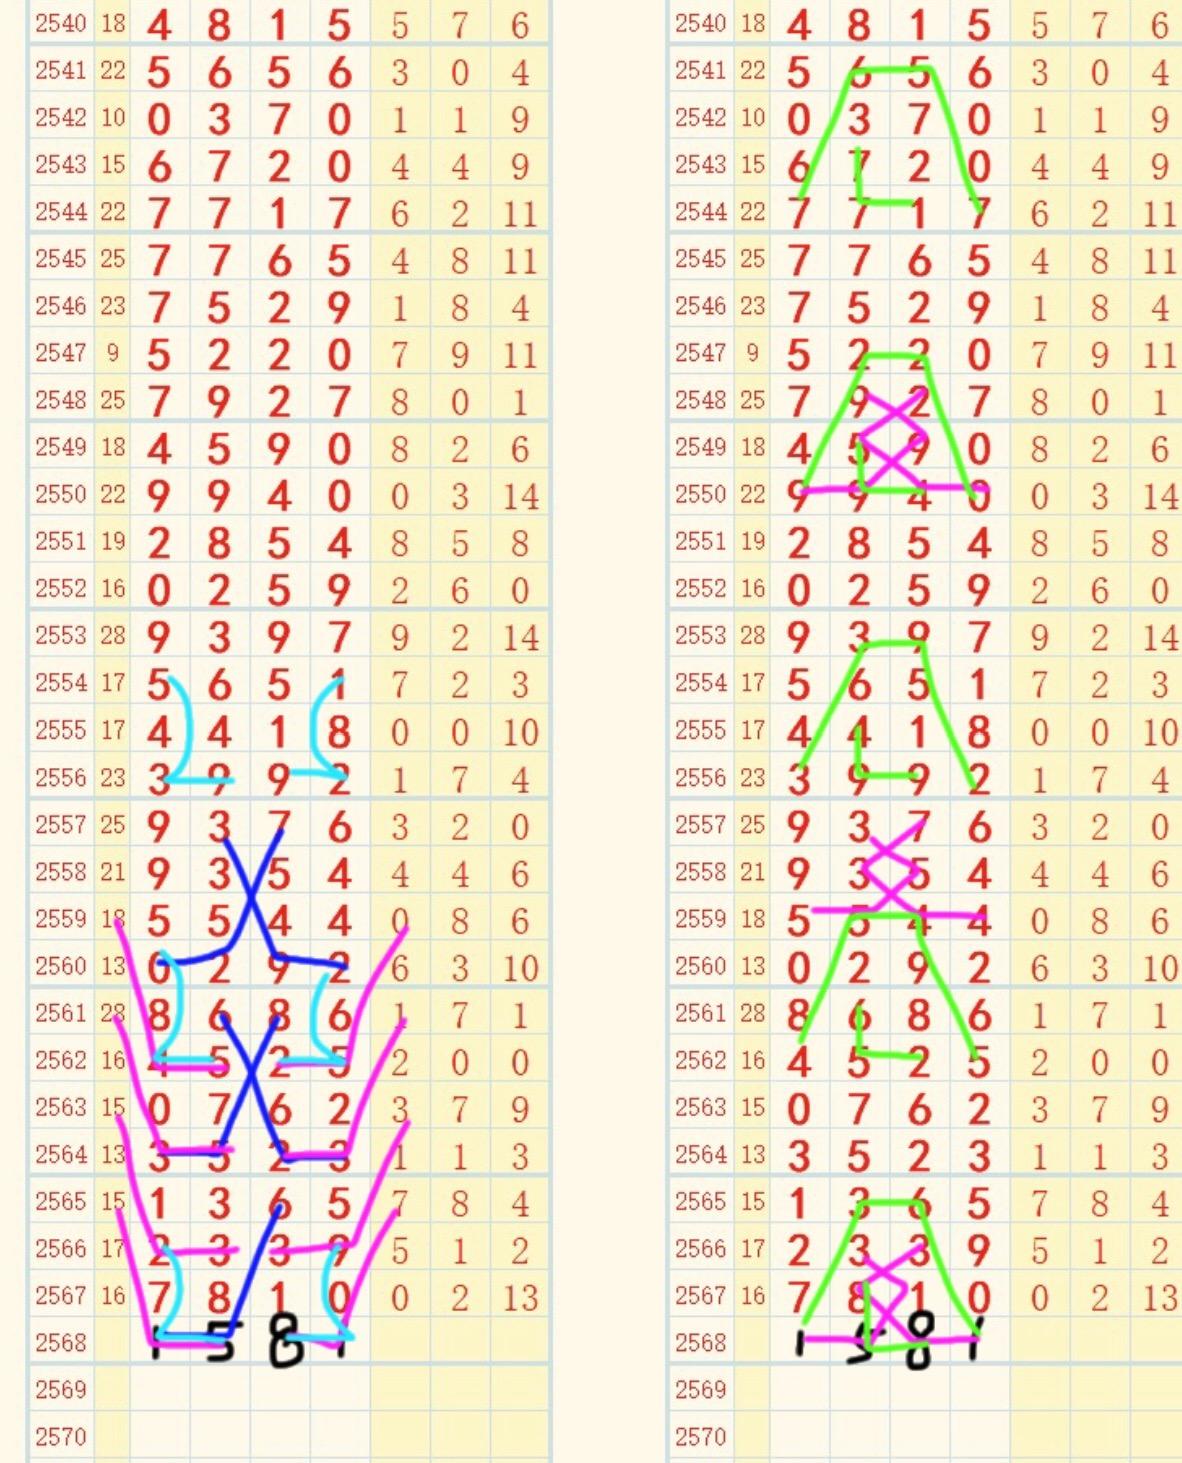 942E1F96-2B22-4AB3-92A8-B74A0396FFA1.jpeg